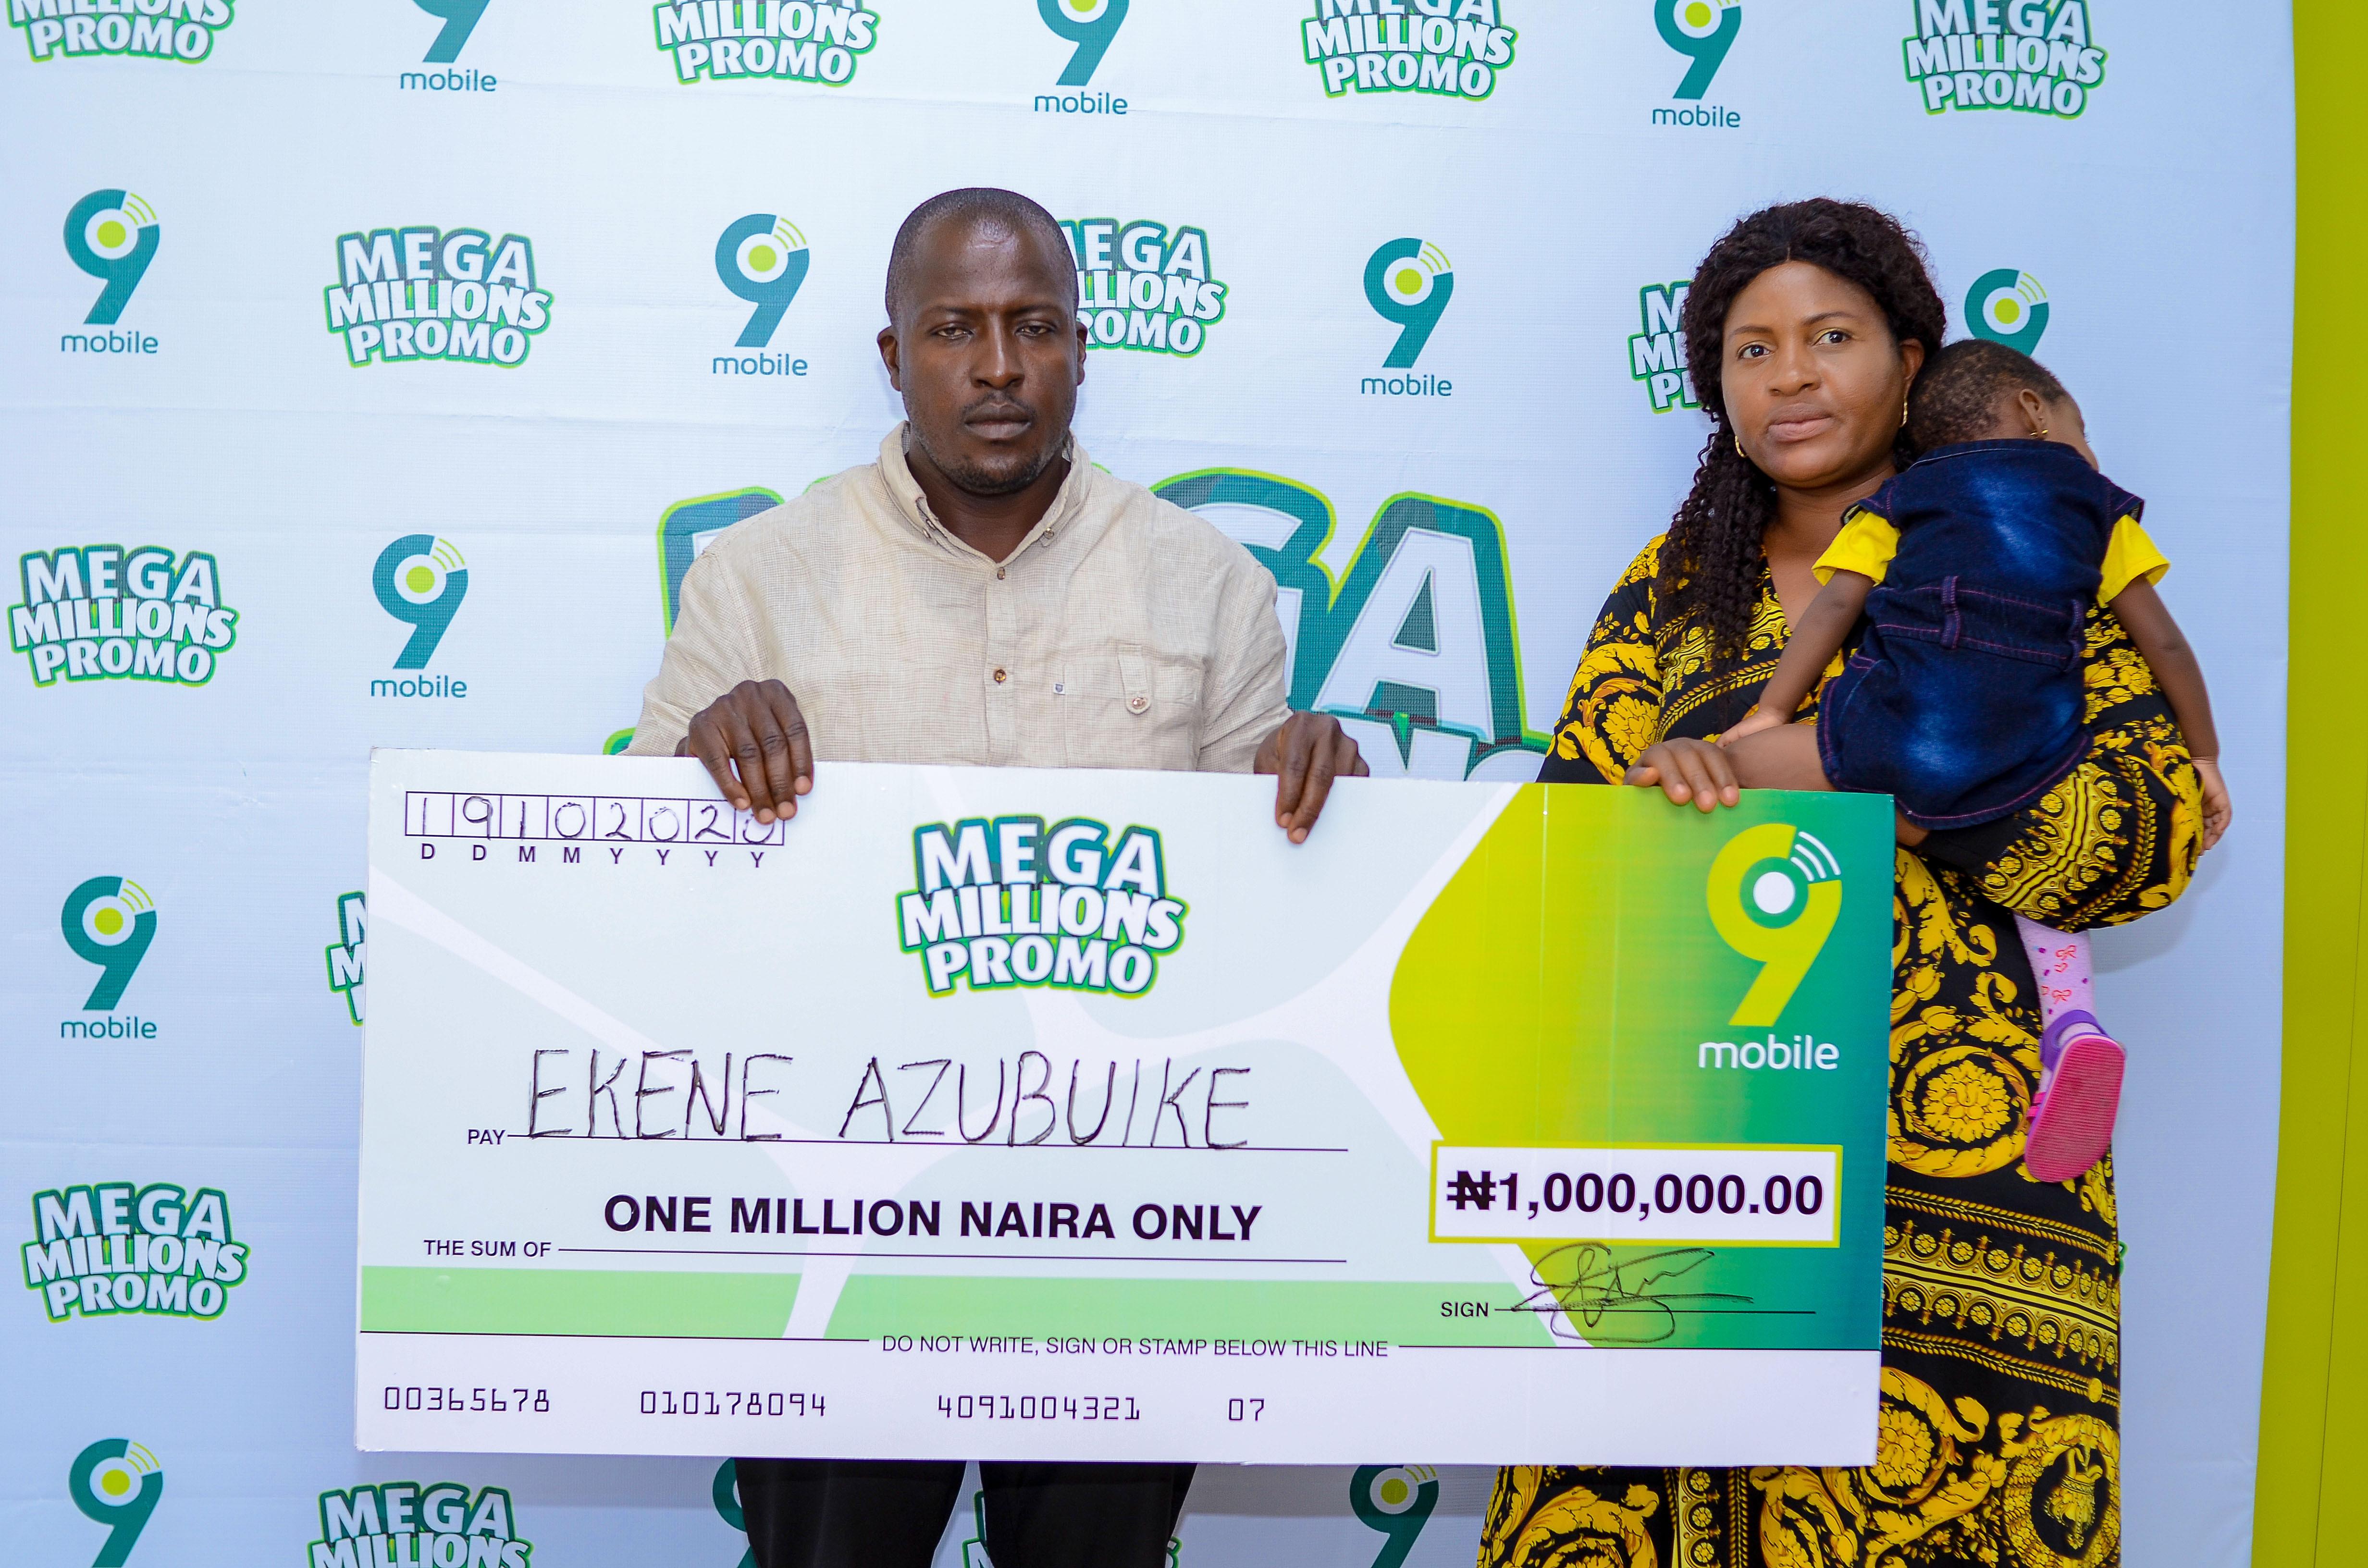 Clock ticking with 26 million Naira left to be won in ongoing 9mobile Mega Millions Promo lindaikejisblog1